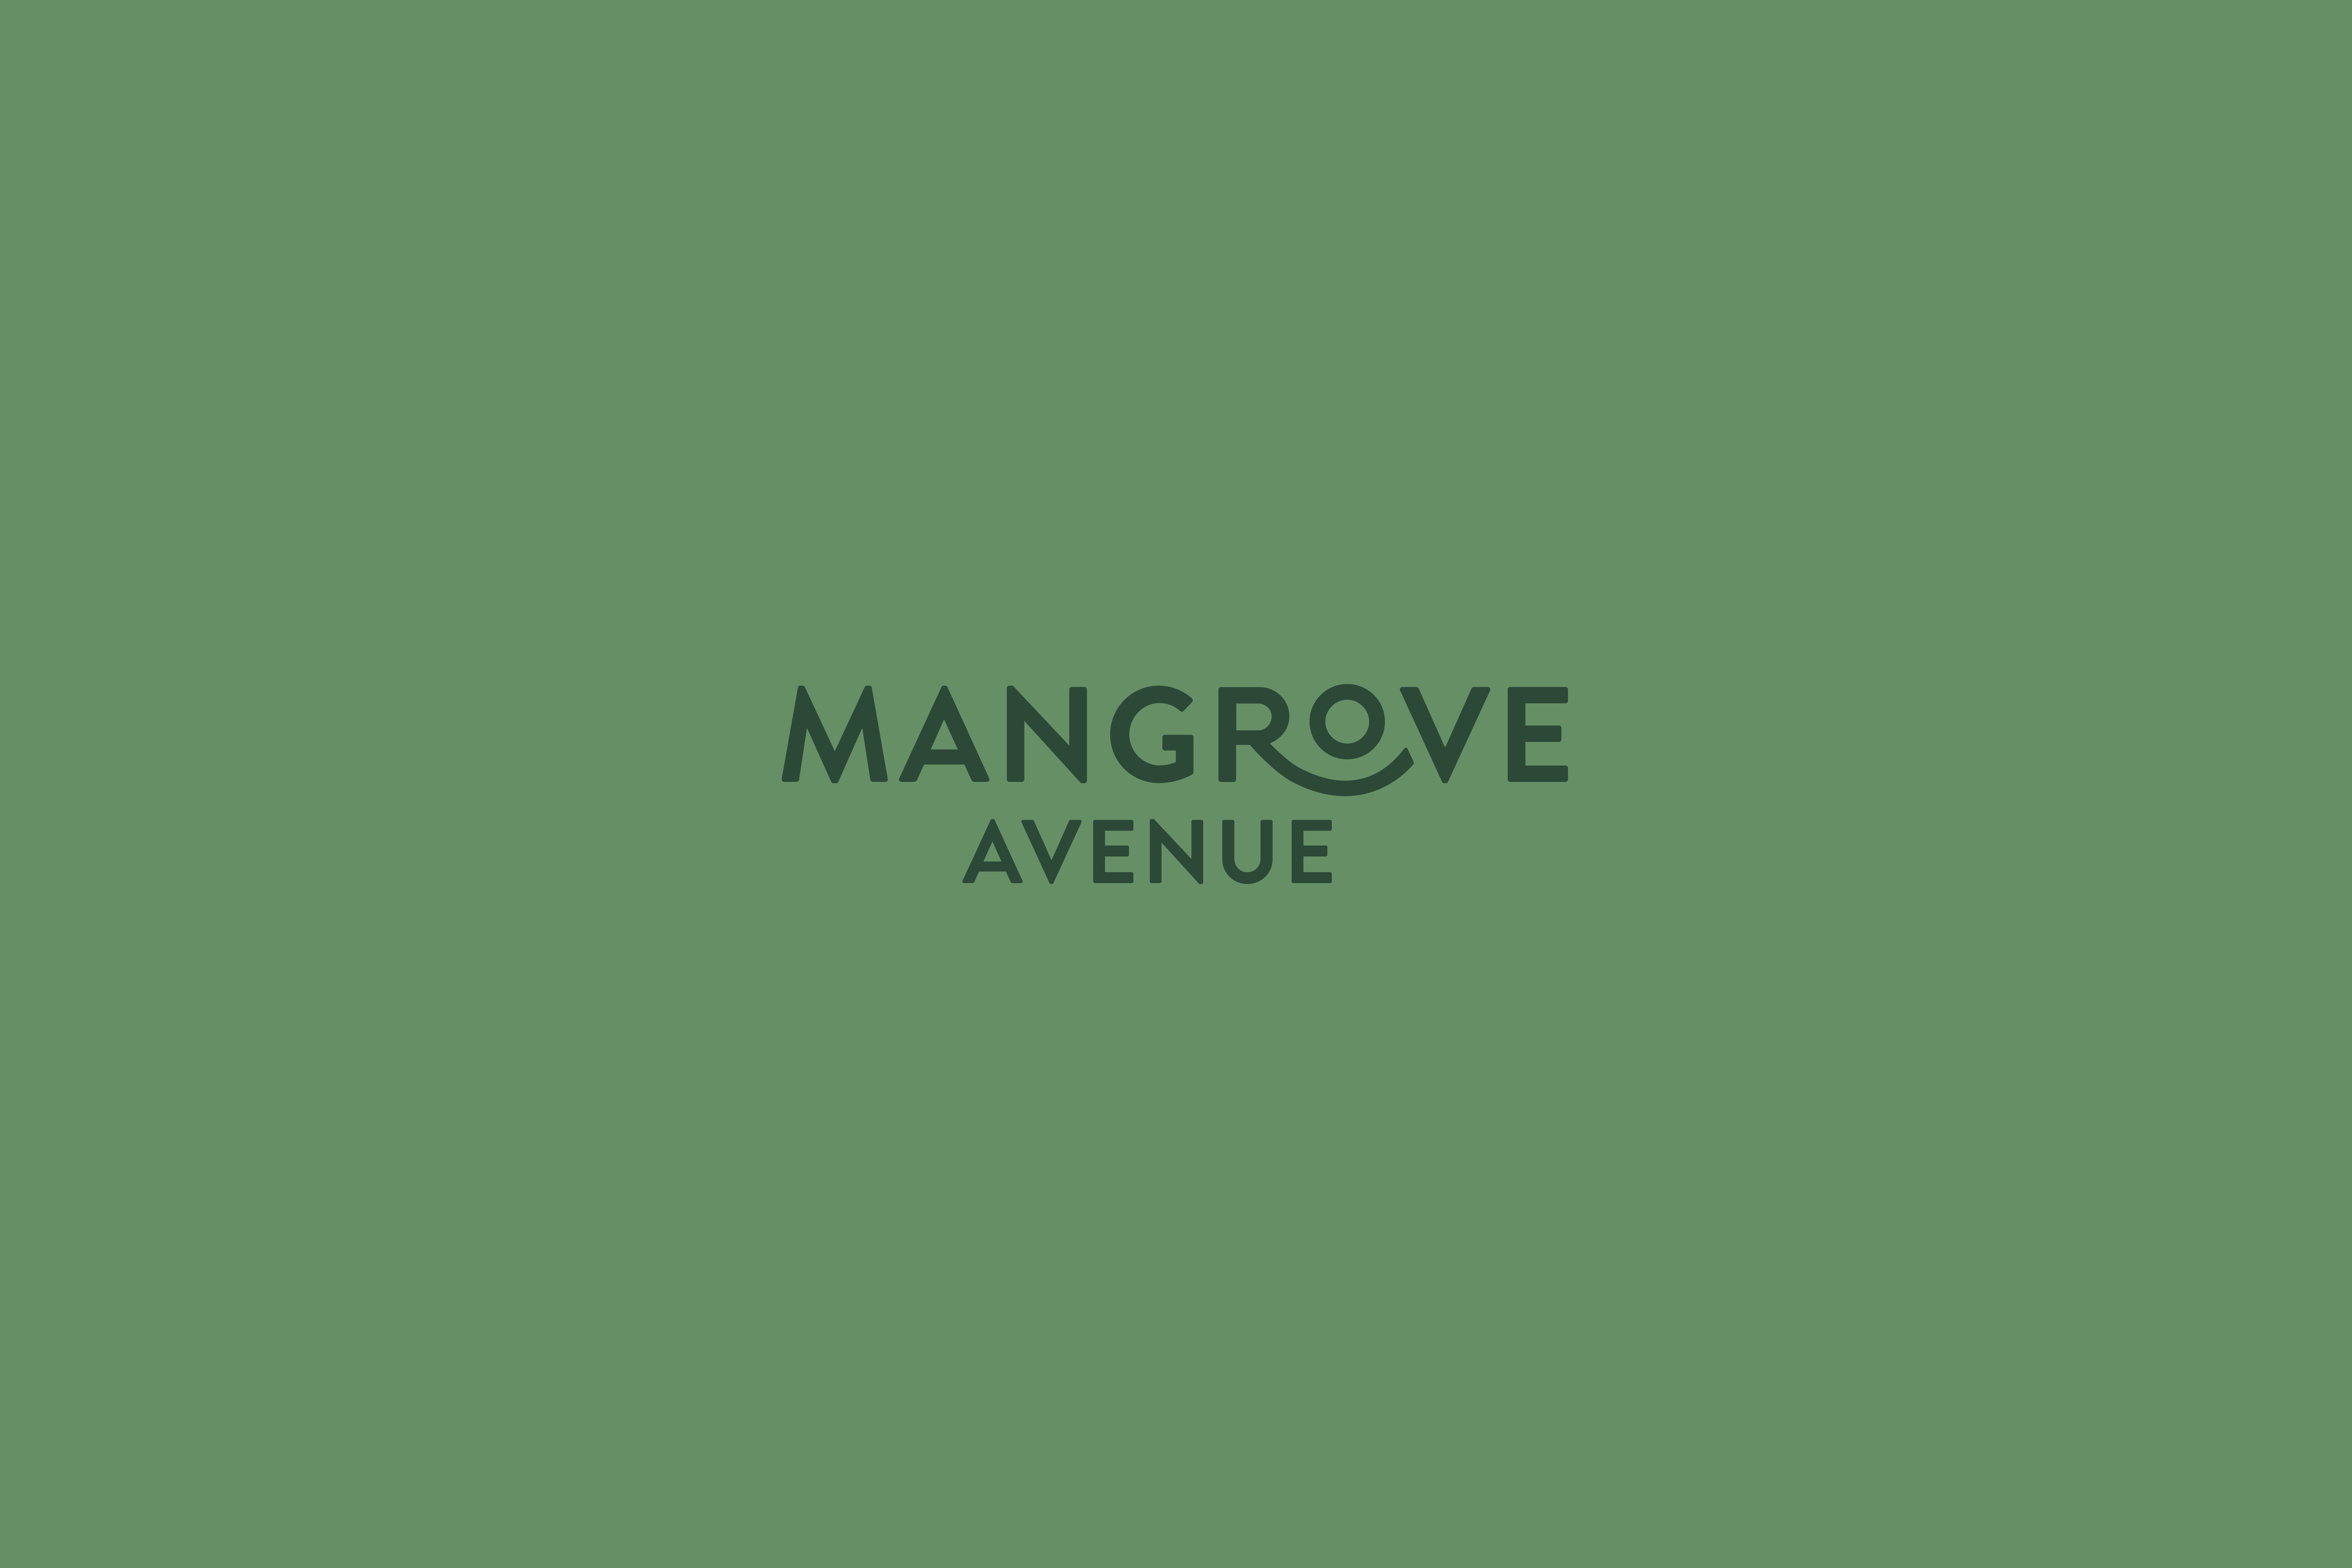 Heyho Co Design Designs the Visual Identity for Mangrove Avenue